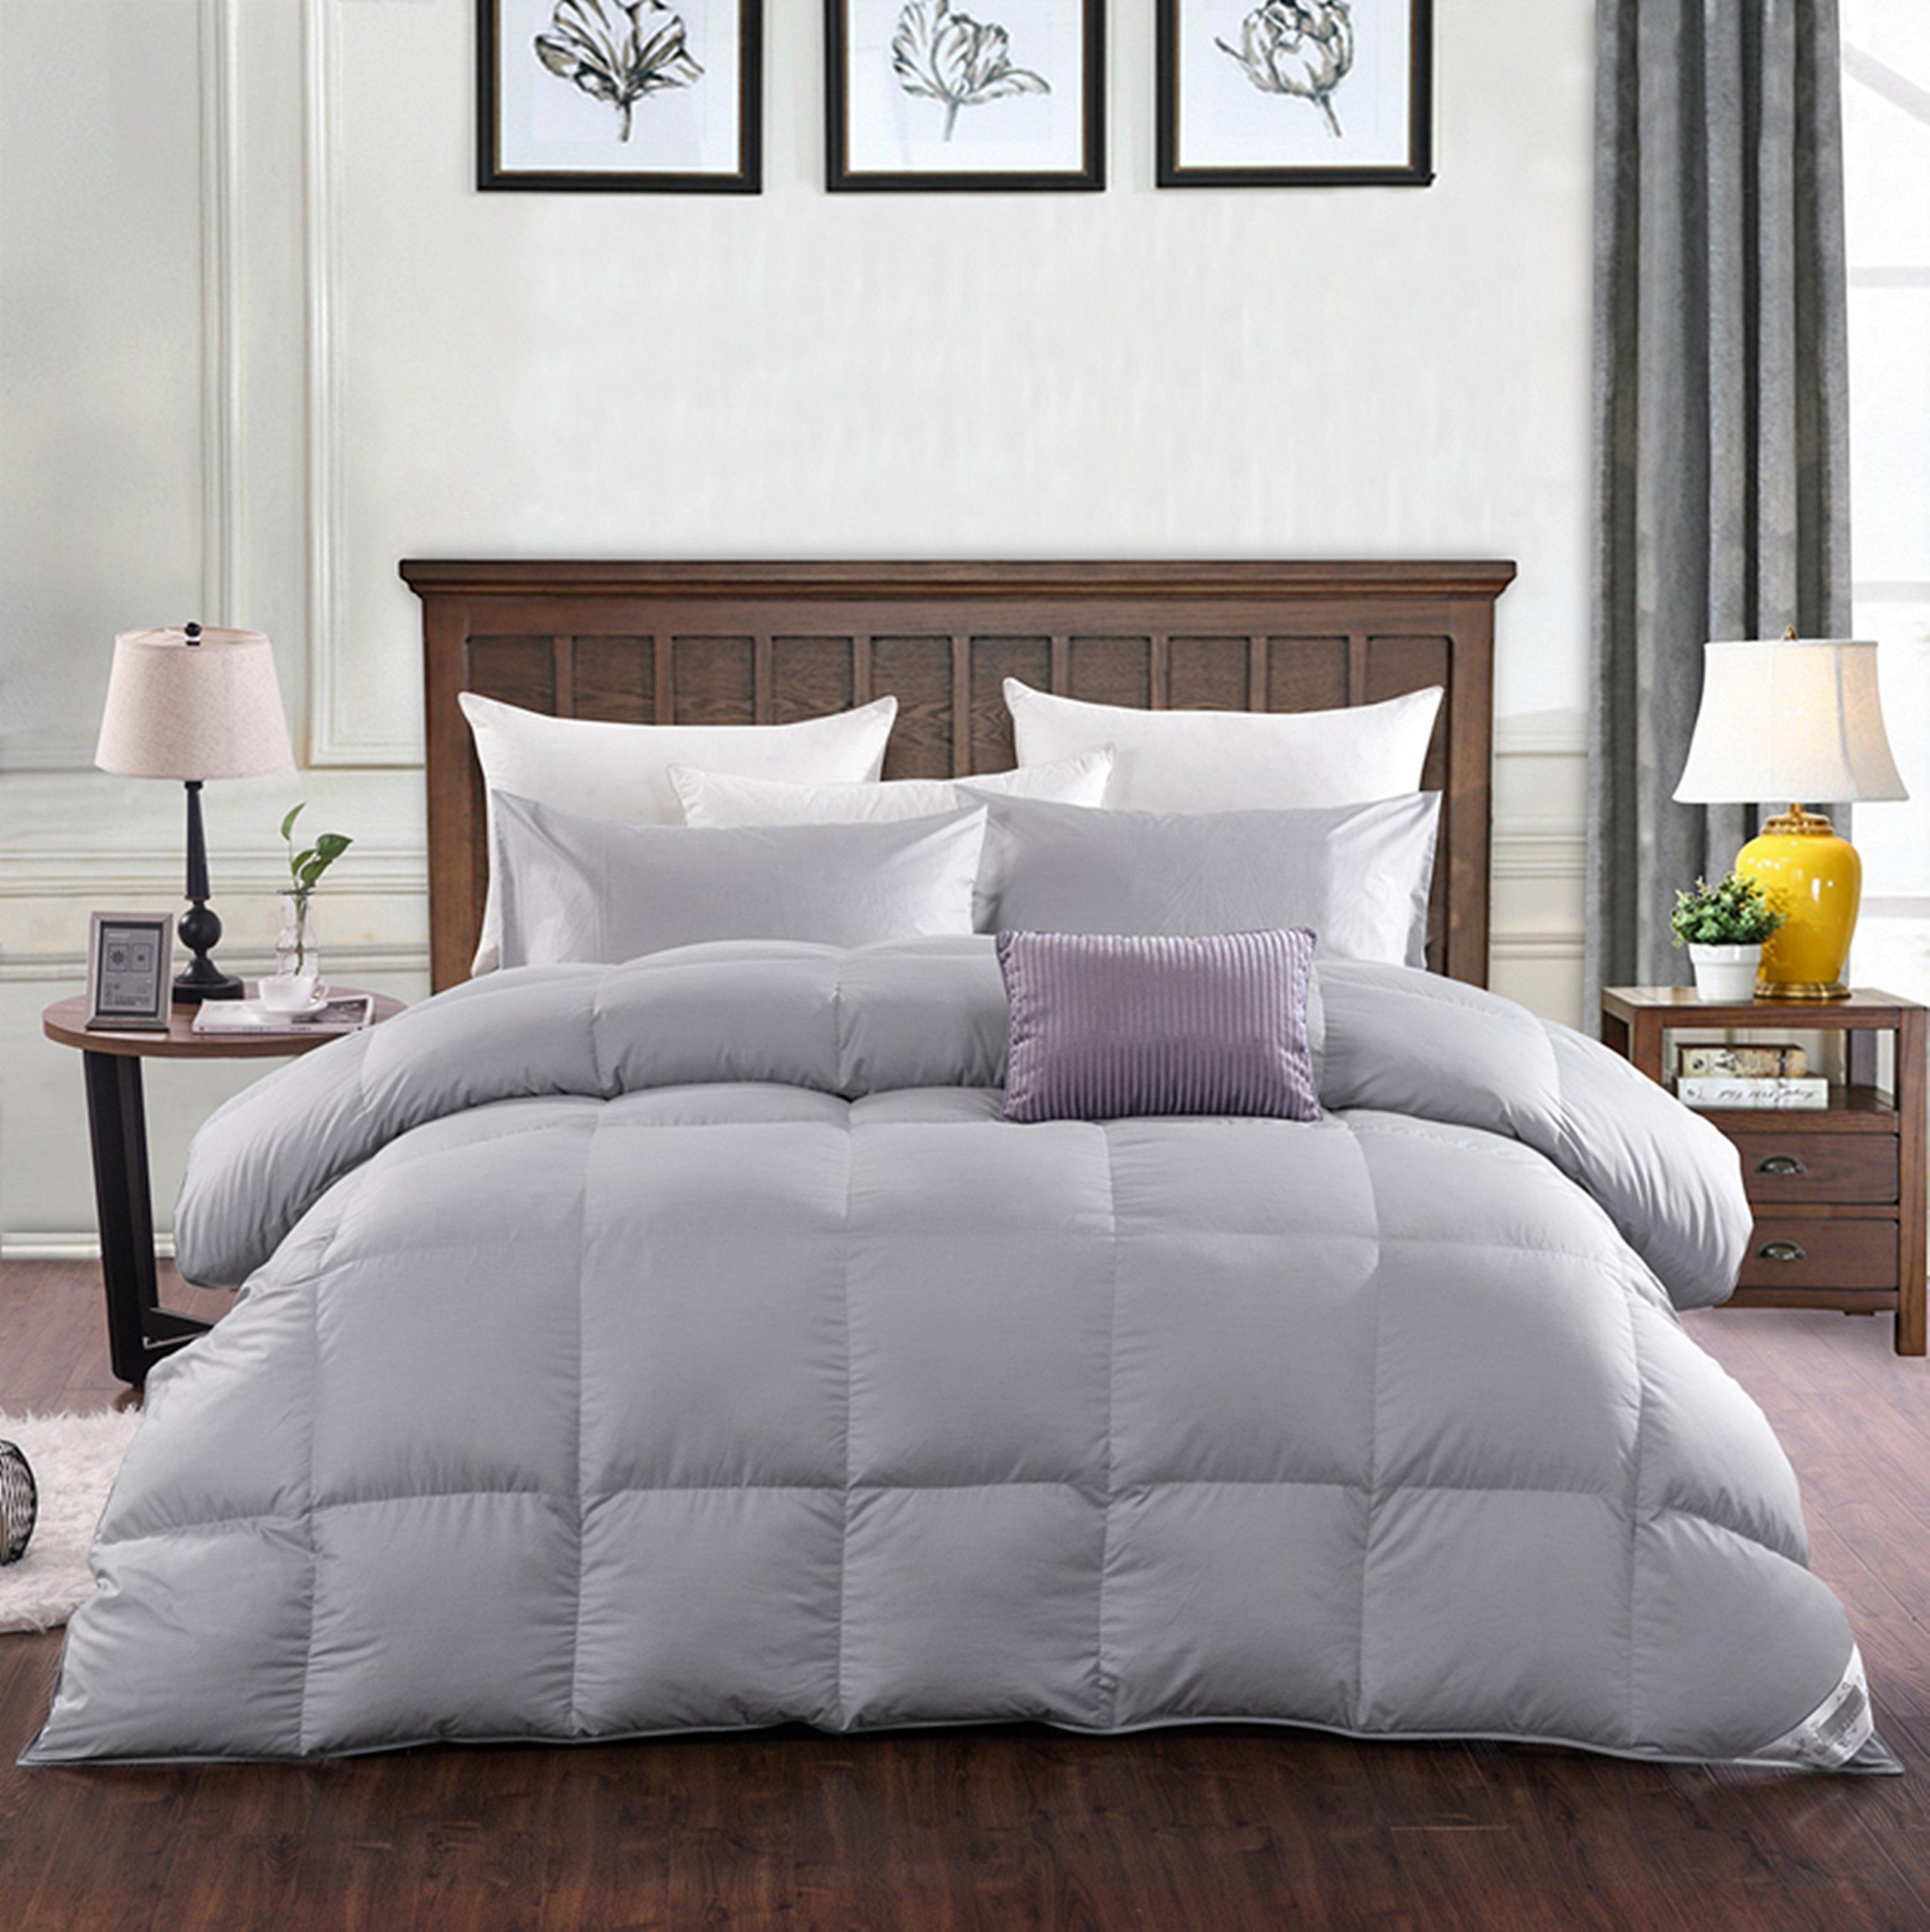 ROSE Light Weight 85/15 White Goose Feather Down Comforter Duvet Quilt,Queen Size,Light Grey